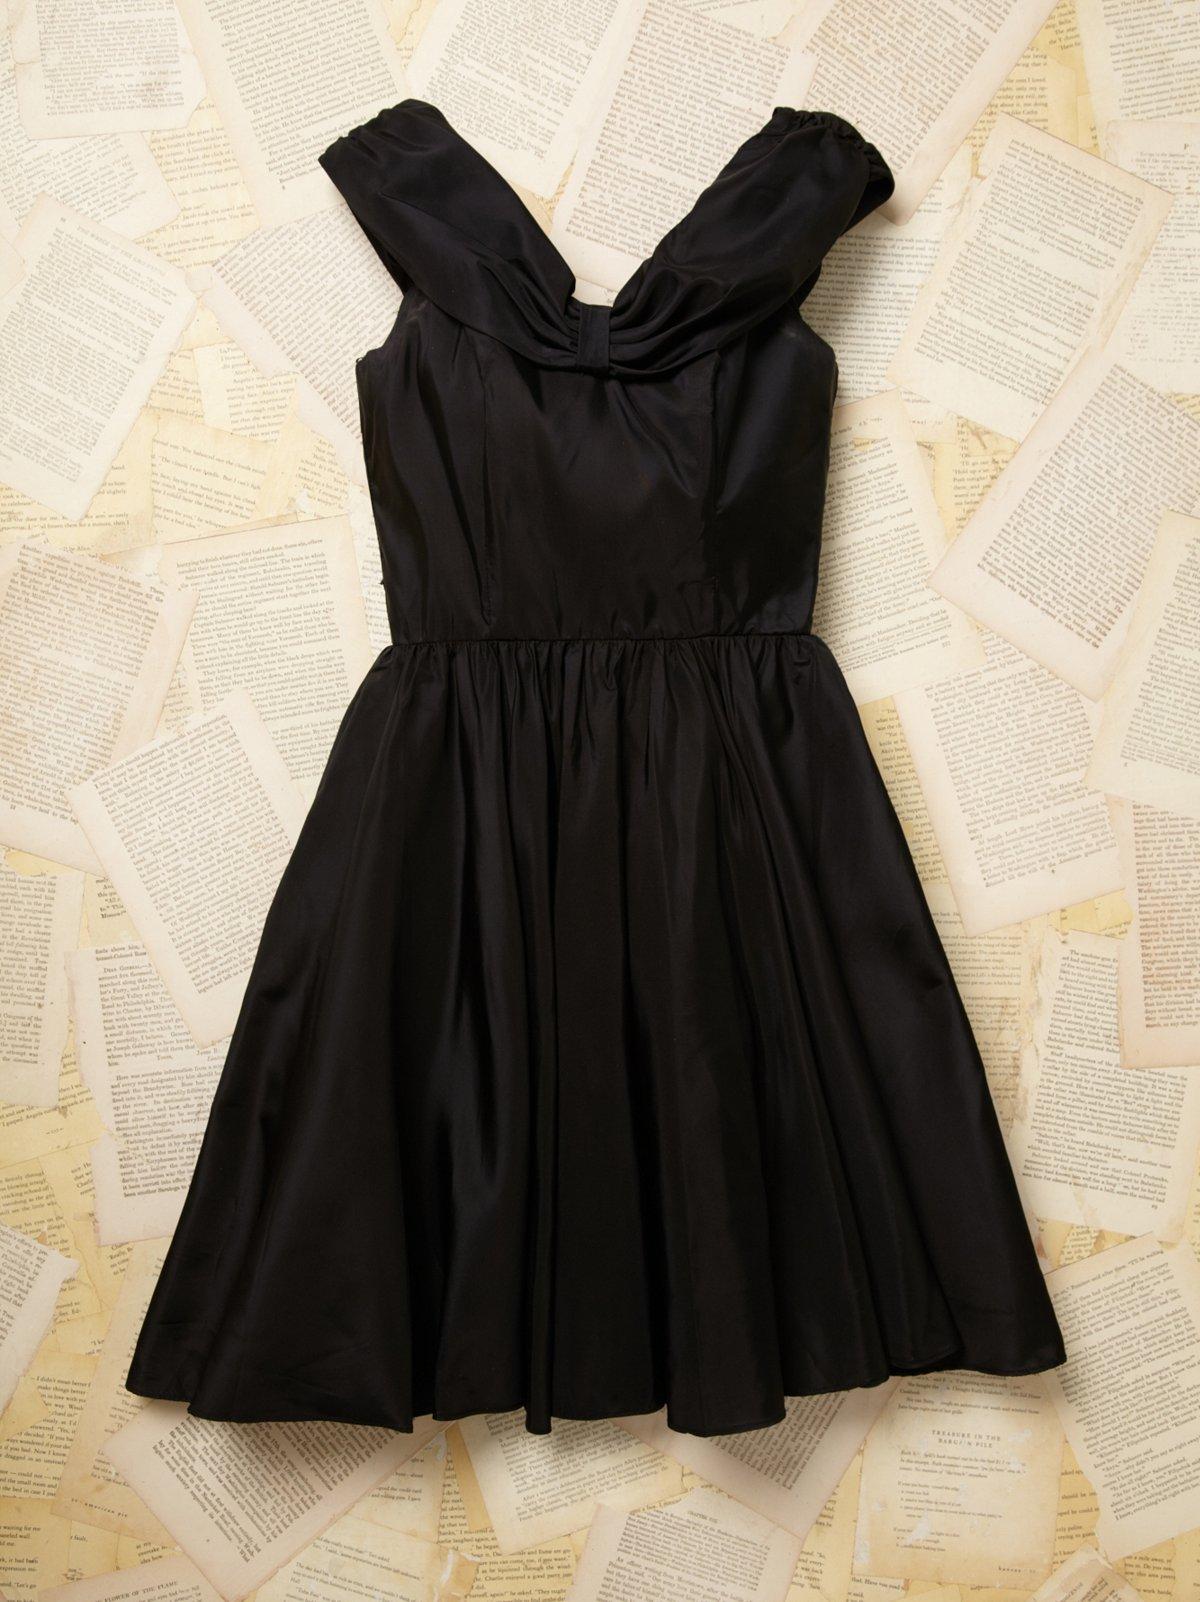 Vintage Sleeveless Bow Dress